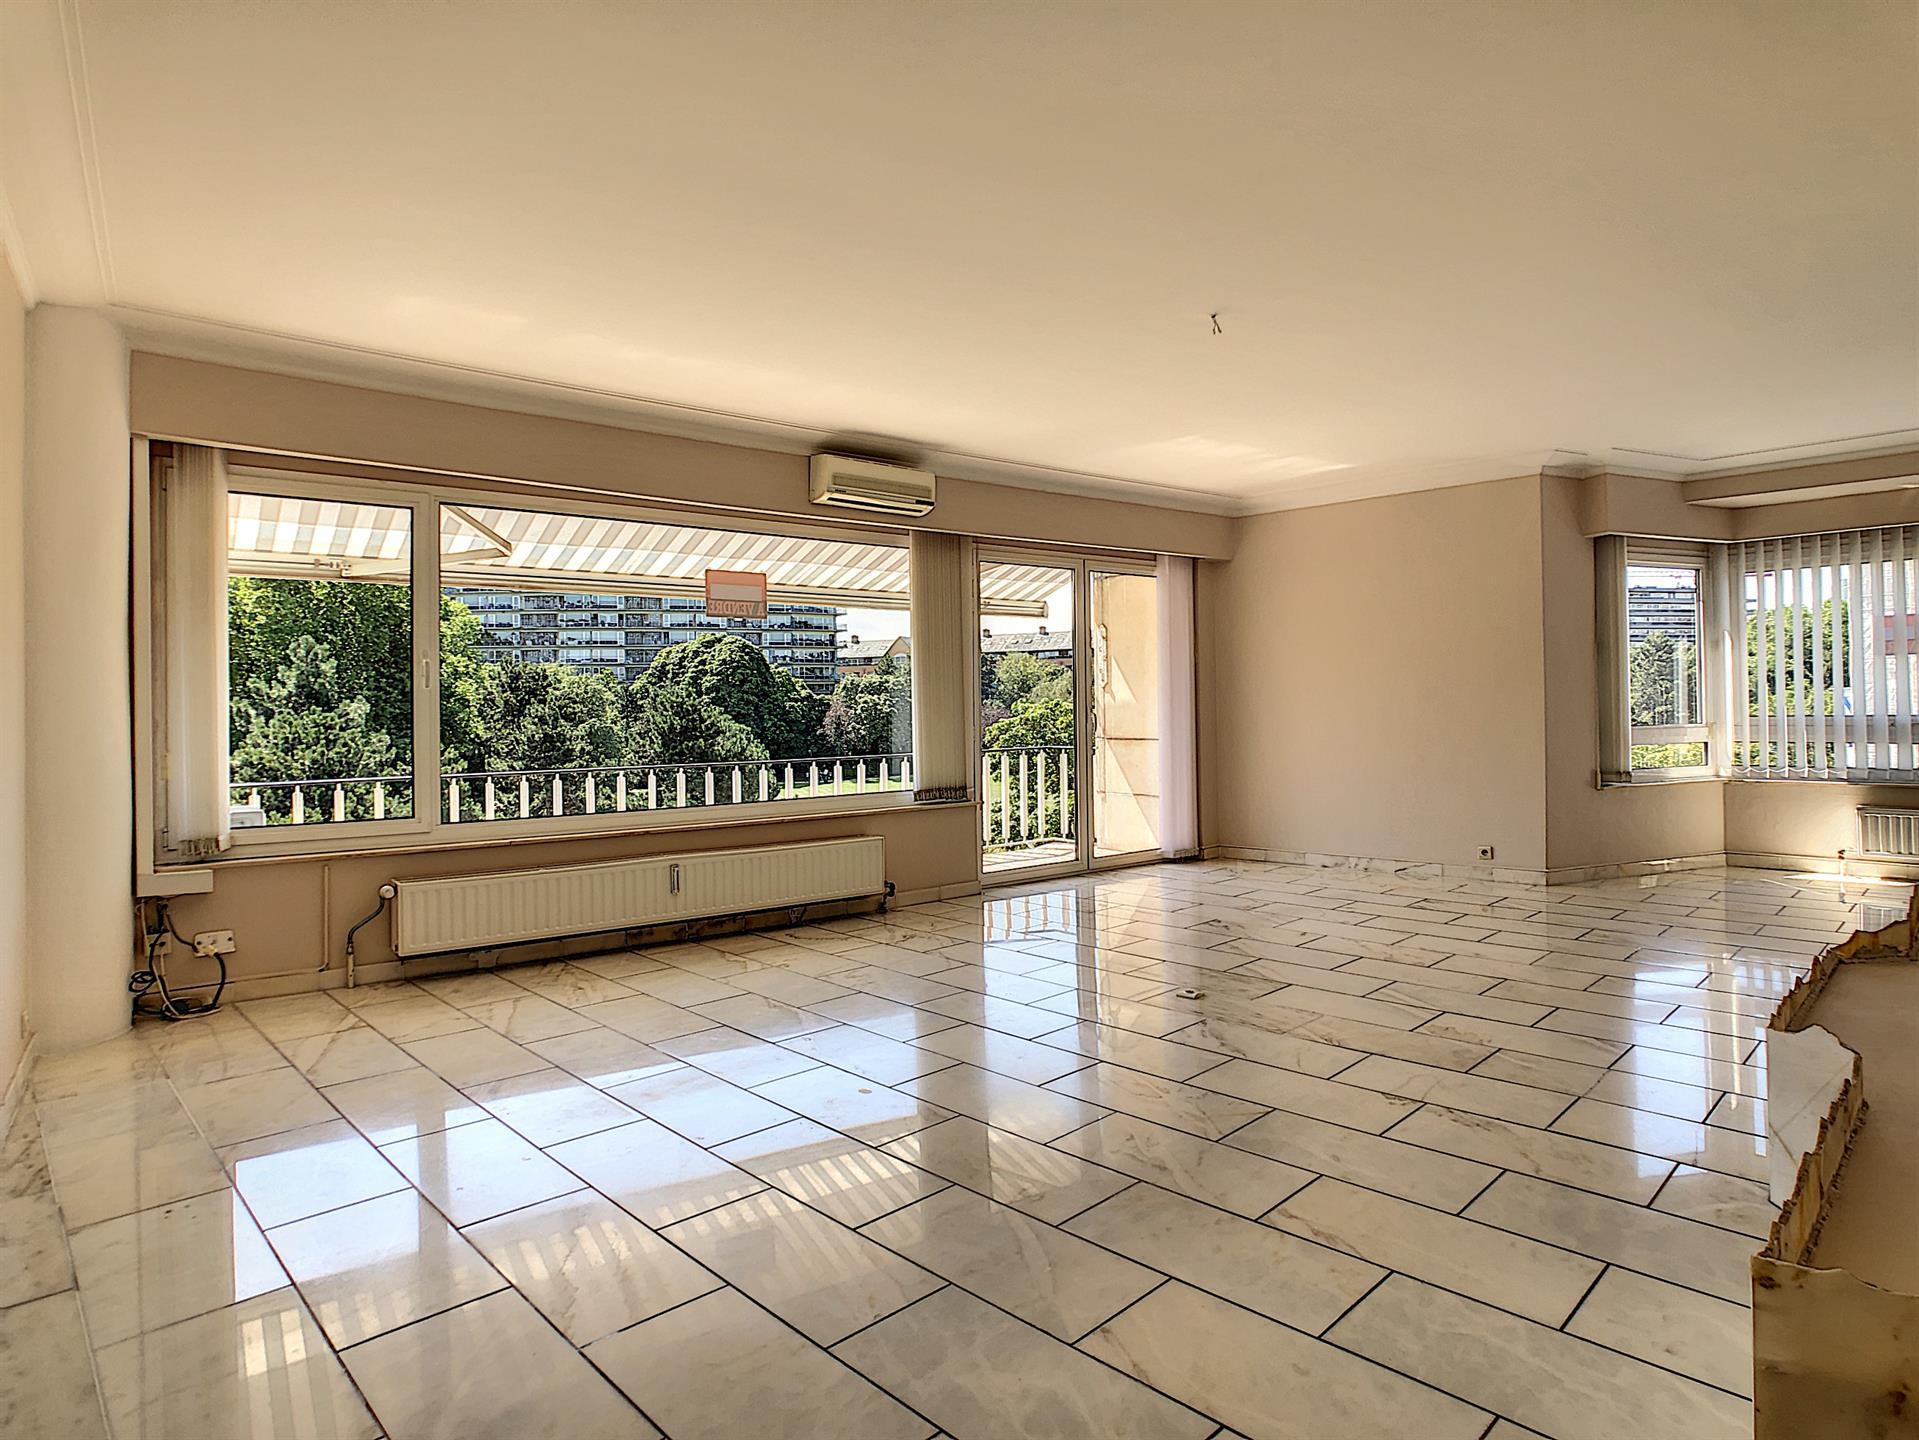 Appartement - Molenbeek-Saint-Jean - #4134416-2